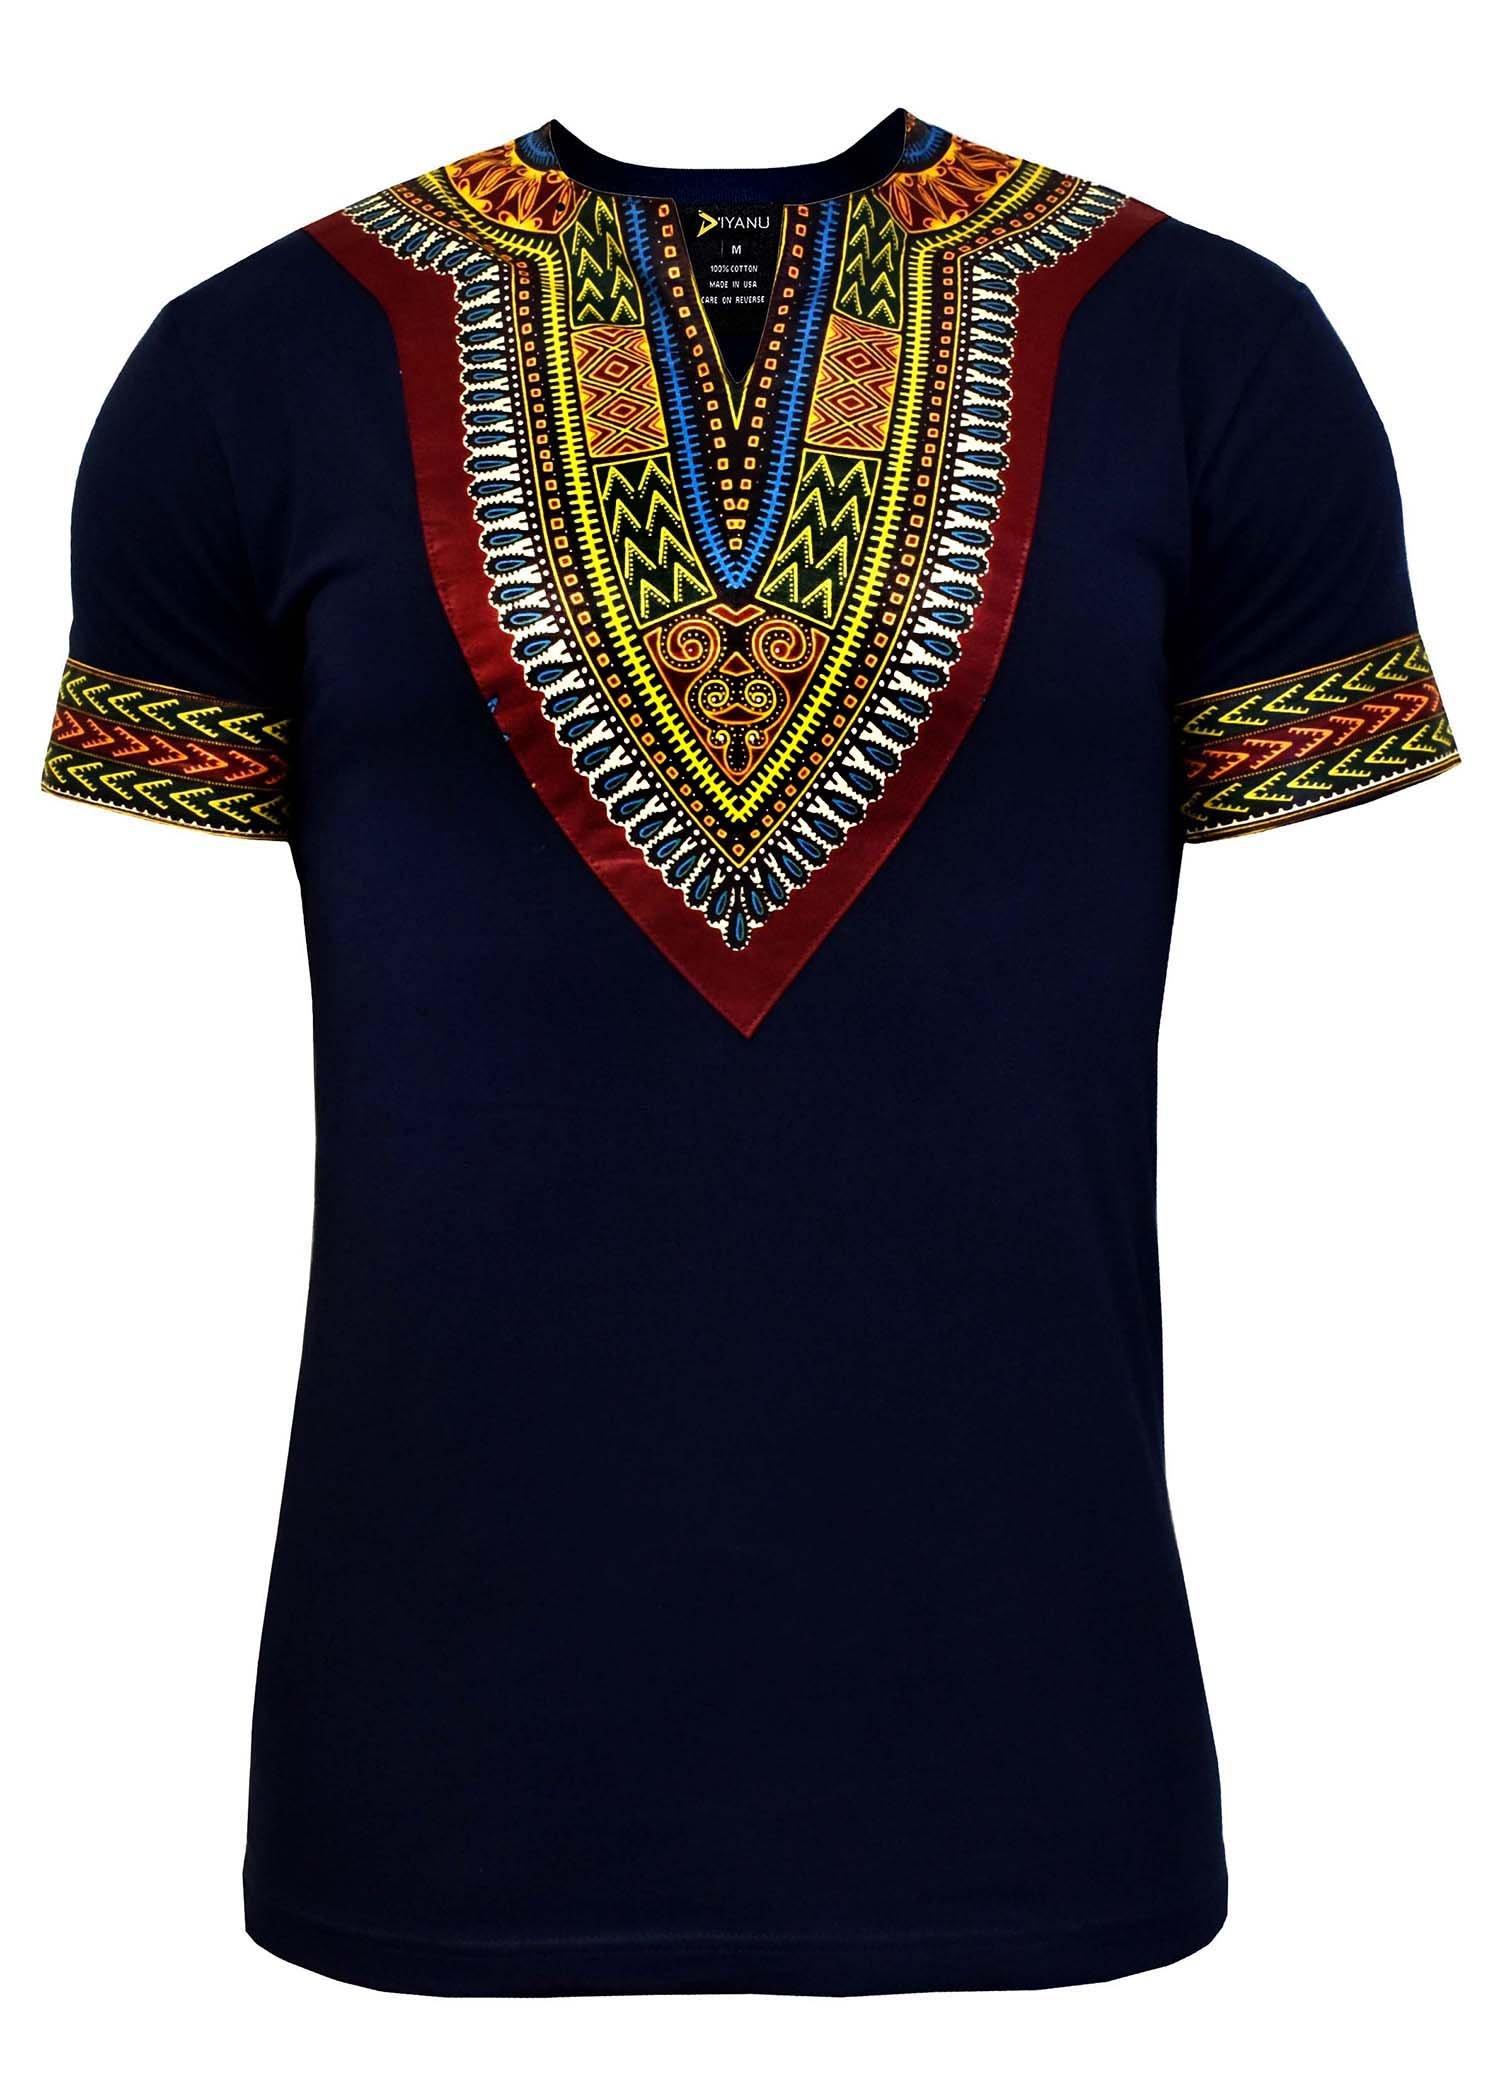 Football Shirts For Women